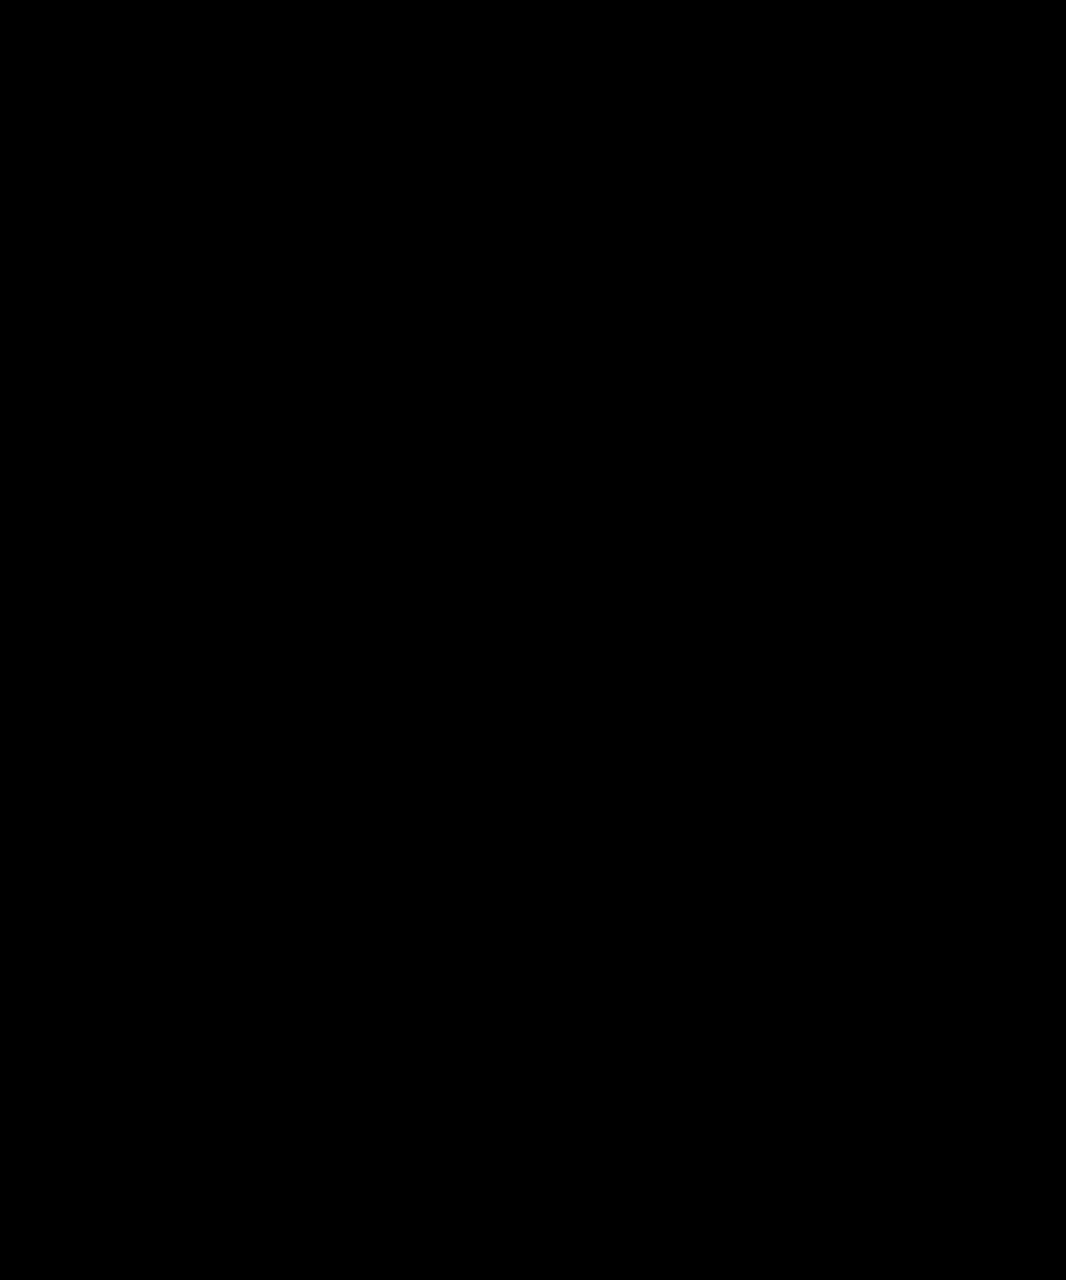 plant, silhouette, grey-312737.jpg